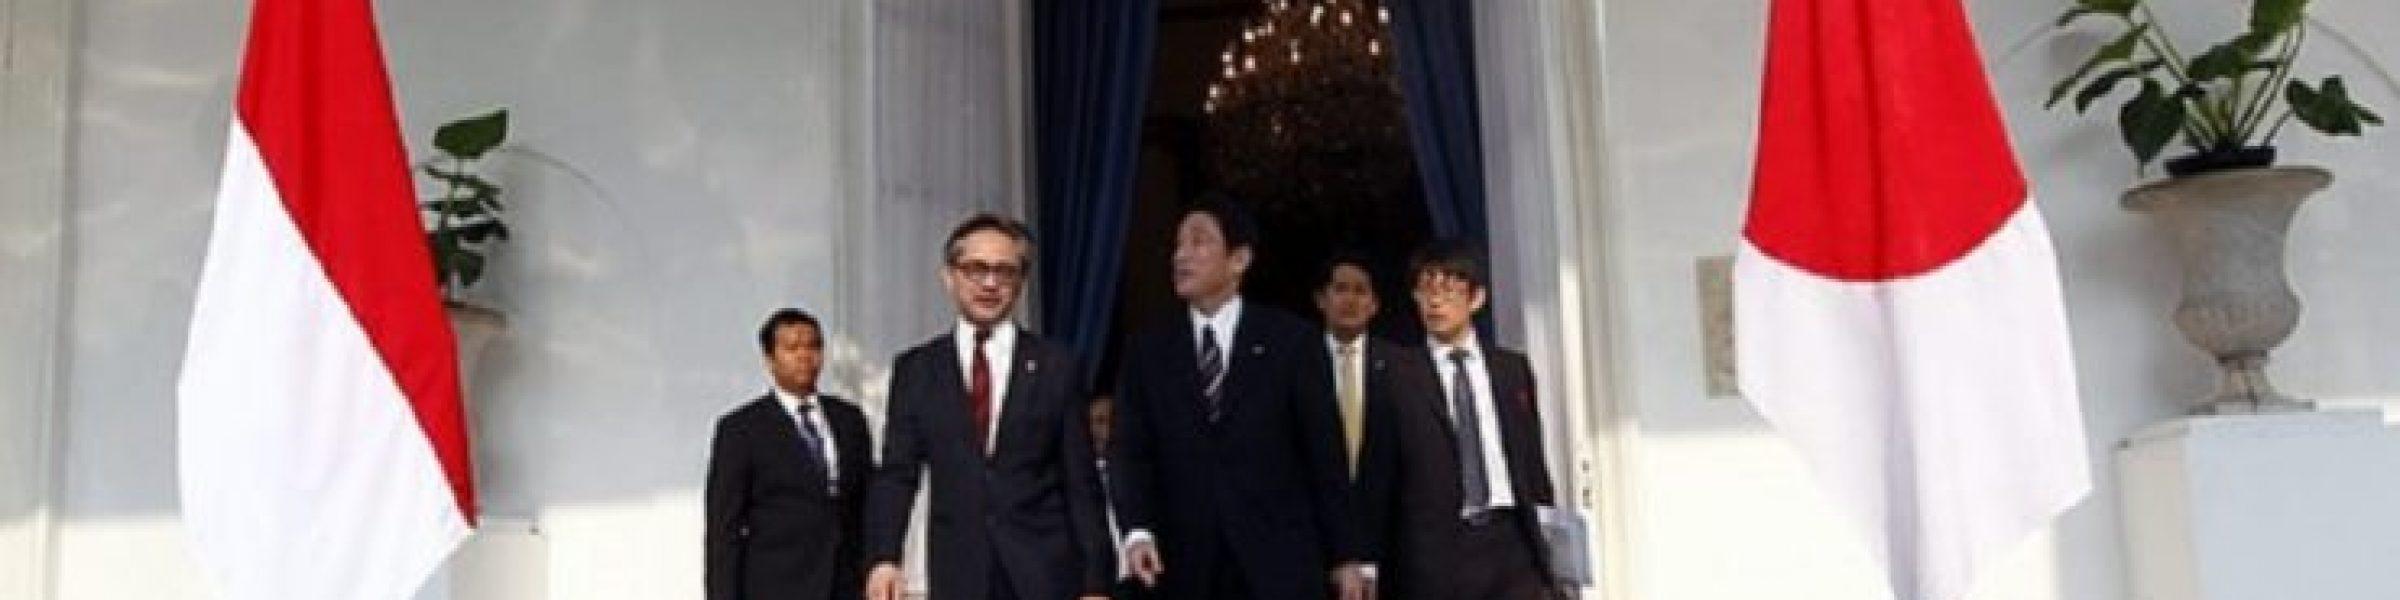 Indonesia-Japan Business ties